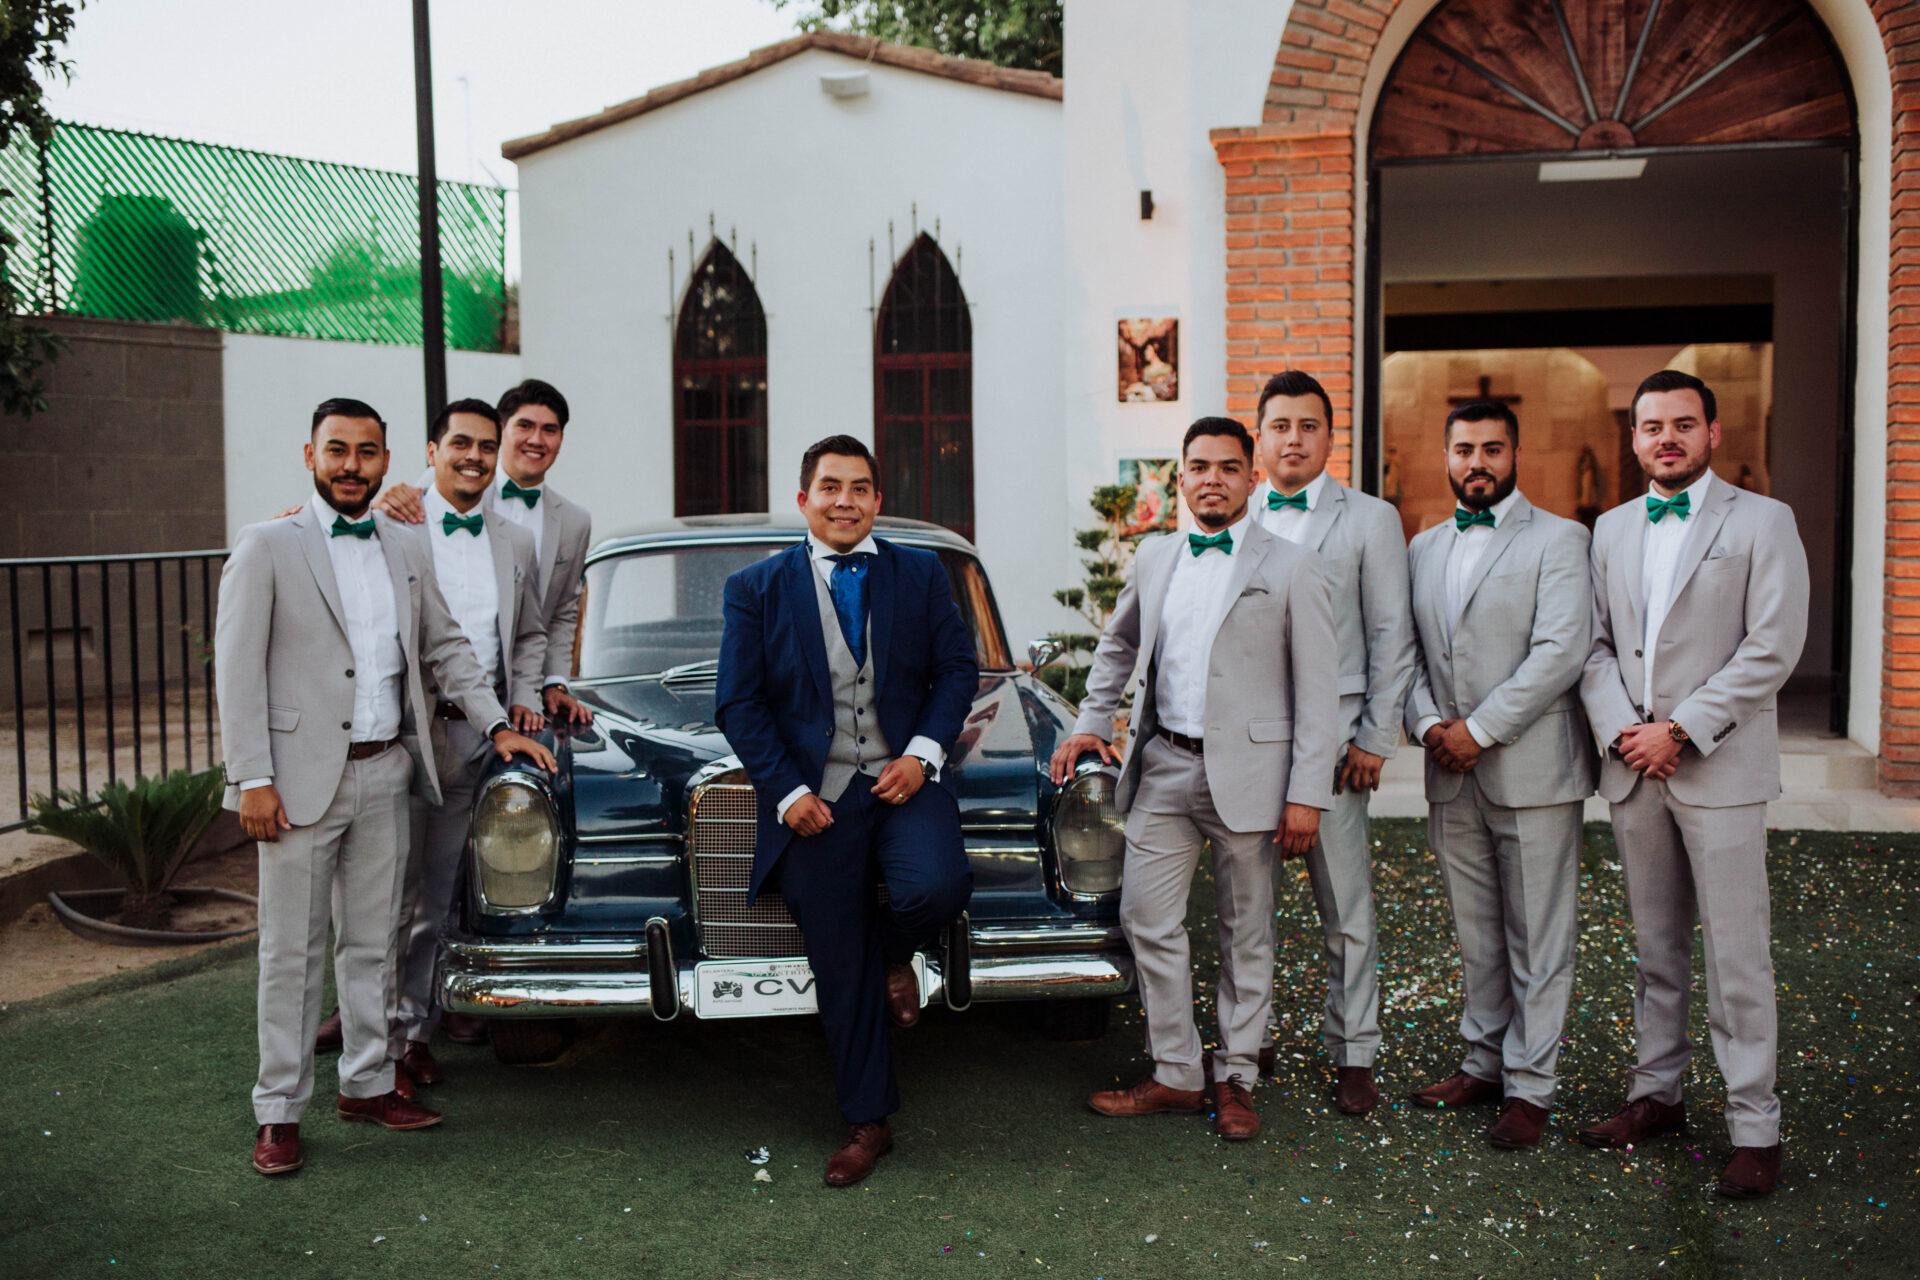 javier_noriega_fotografo_bodas_torreon_coahuila_zacatecas_wedding_photographer43a